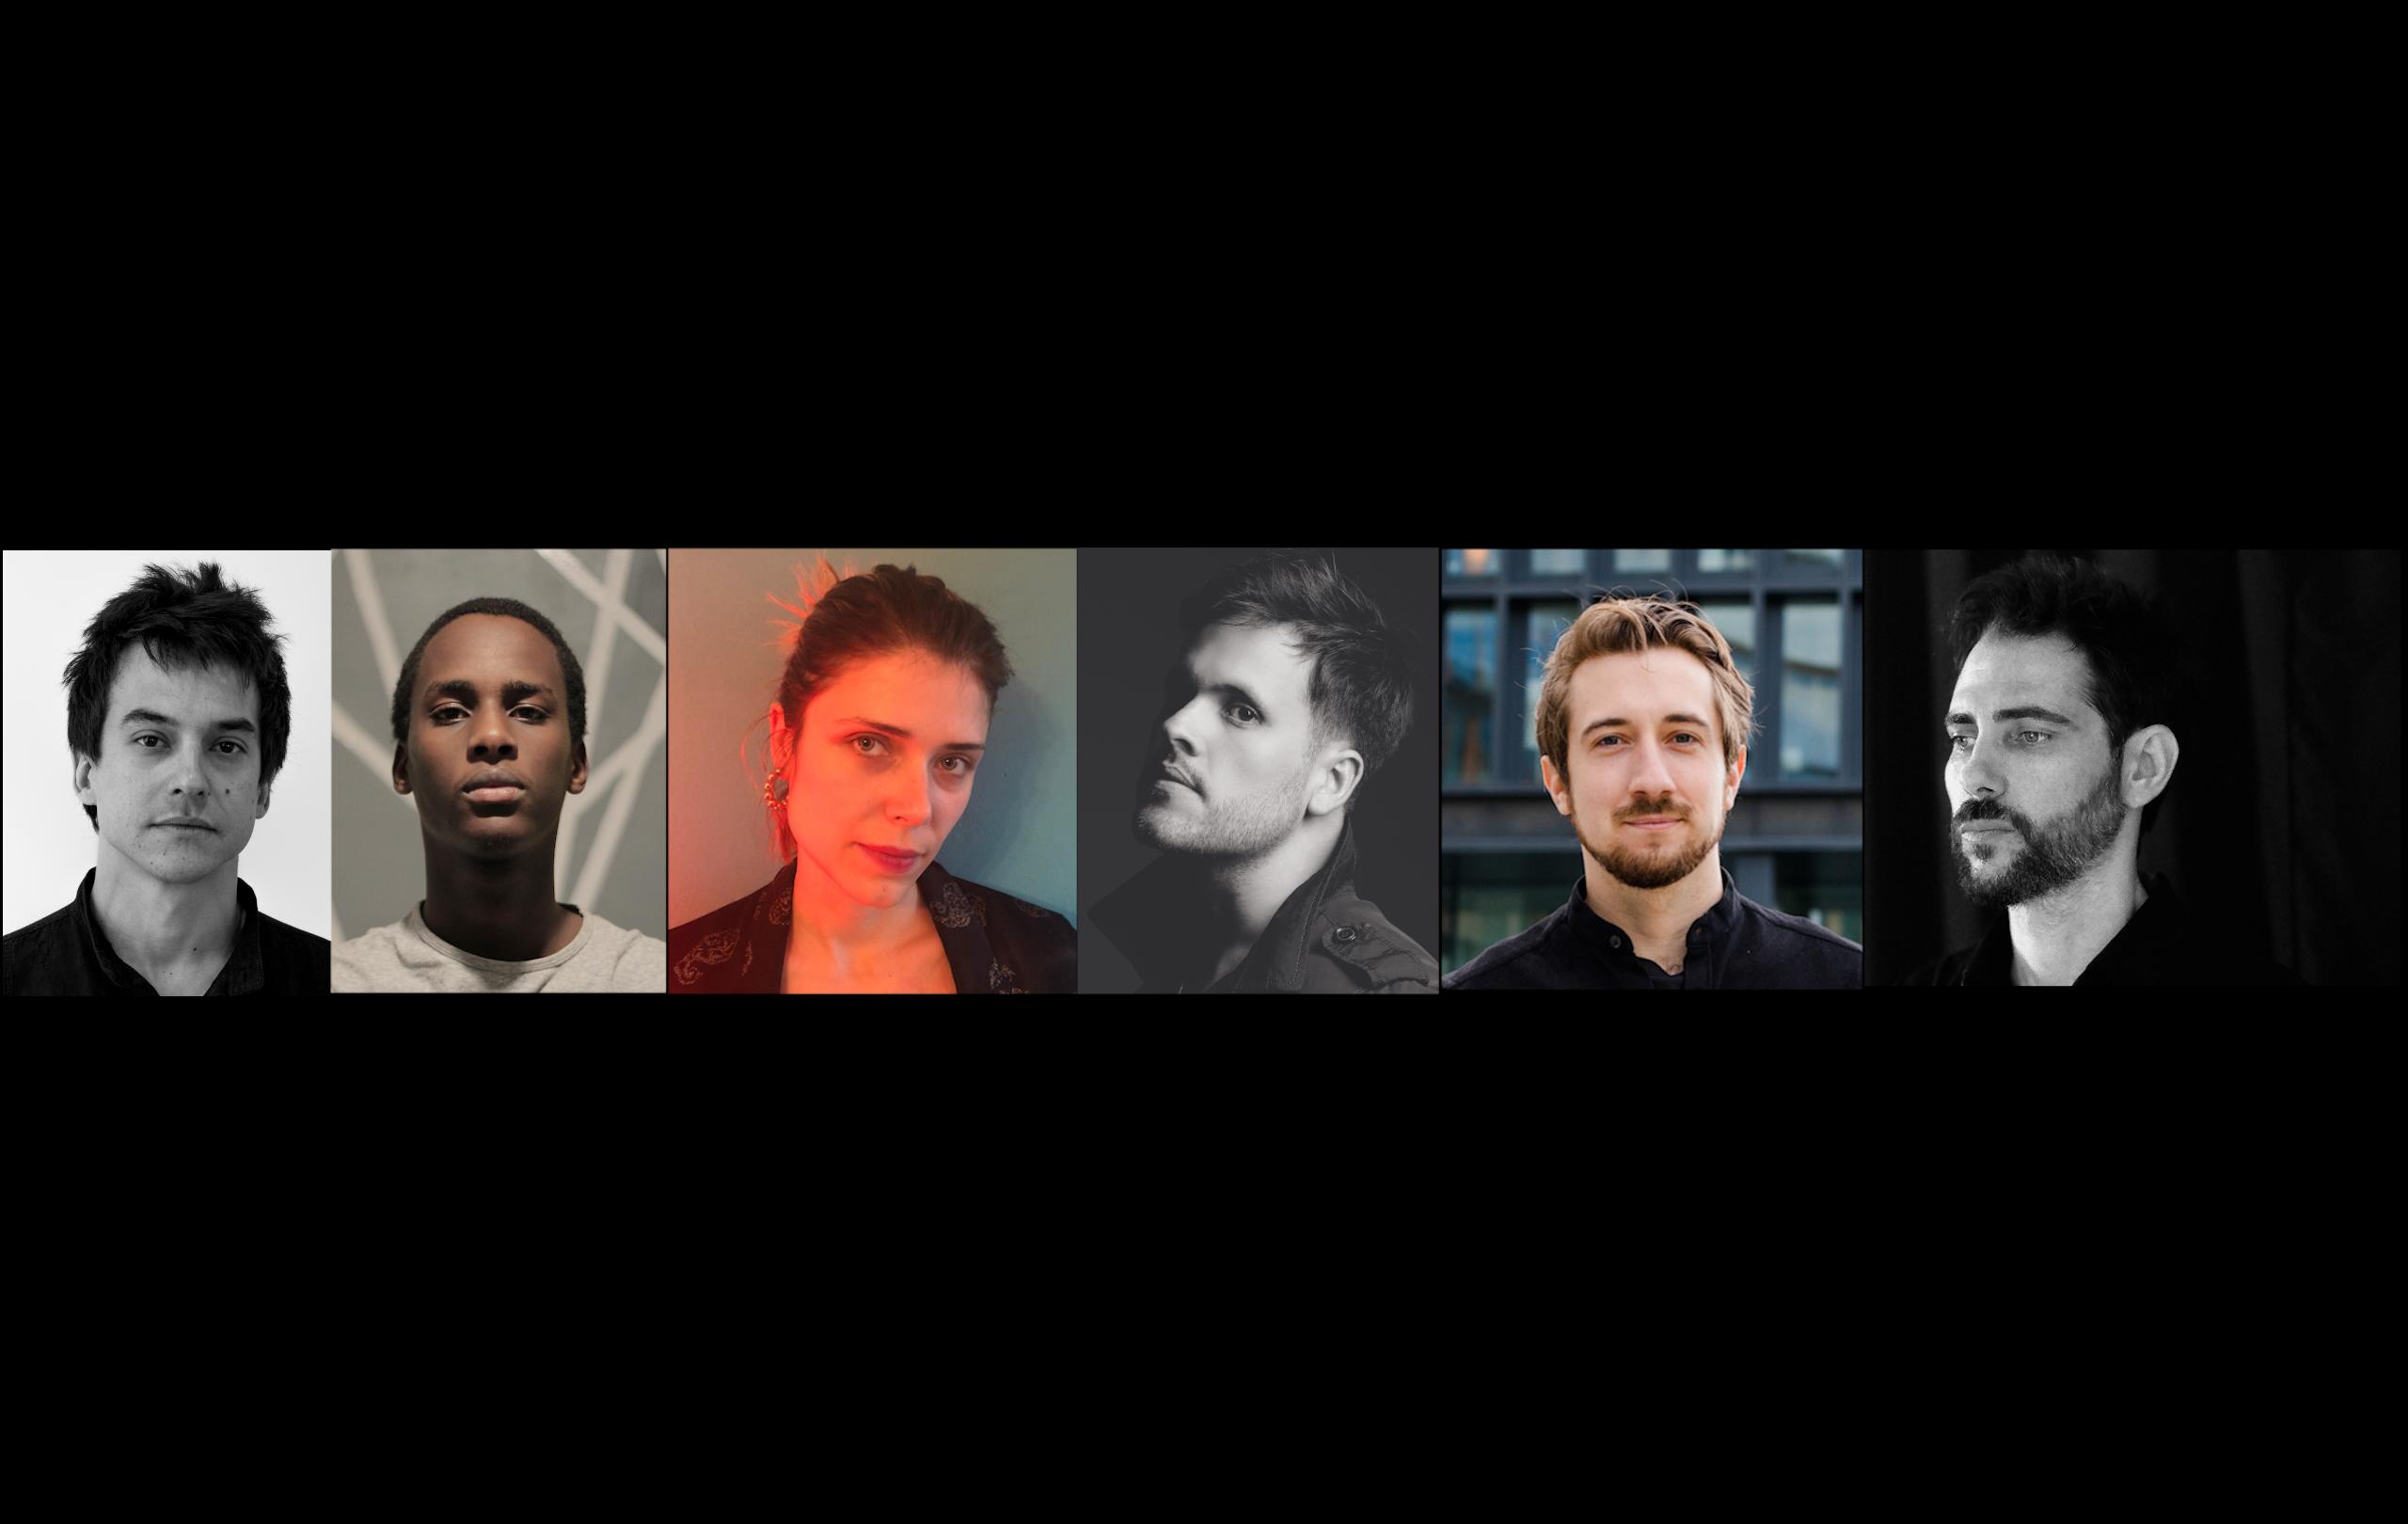 Guillermo Garcia Lopez, Samuel Ishimwe, Hana Jusic, Rodrigo Barriuso, Bernhard Wenger, Miki Polonski